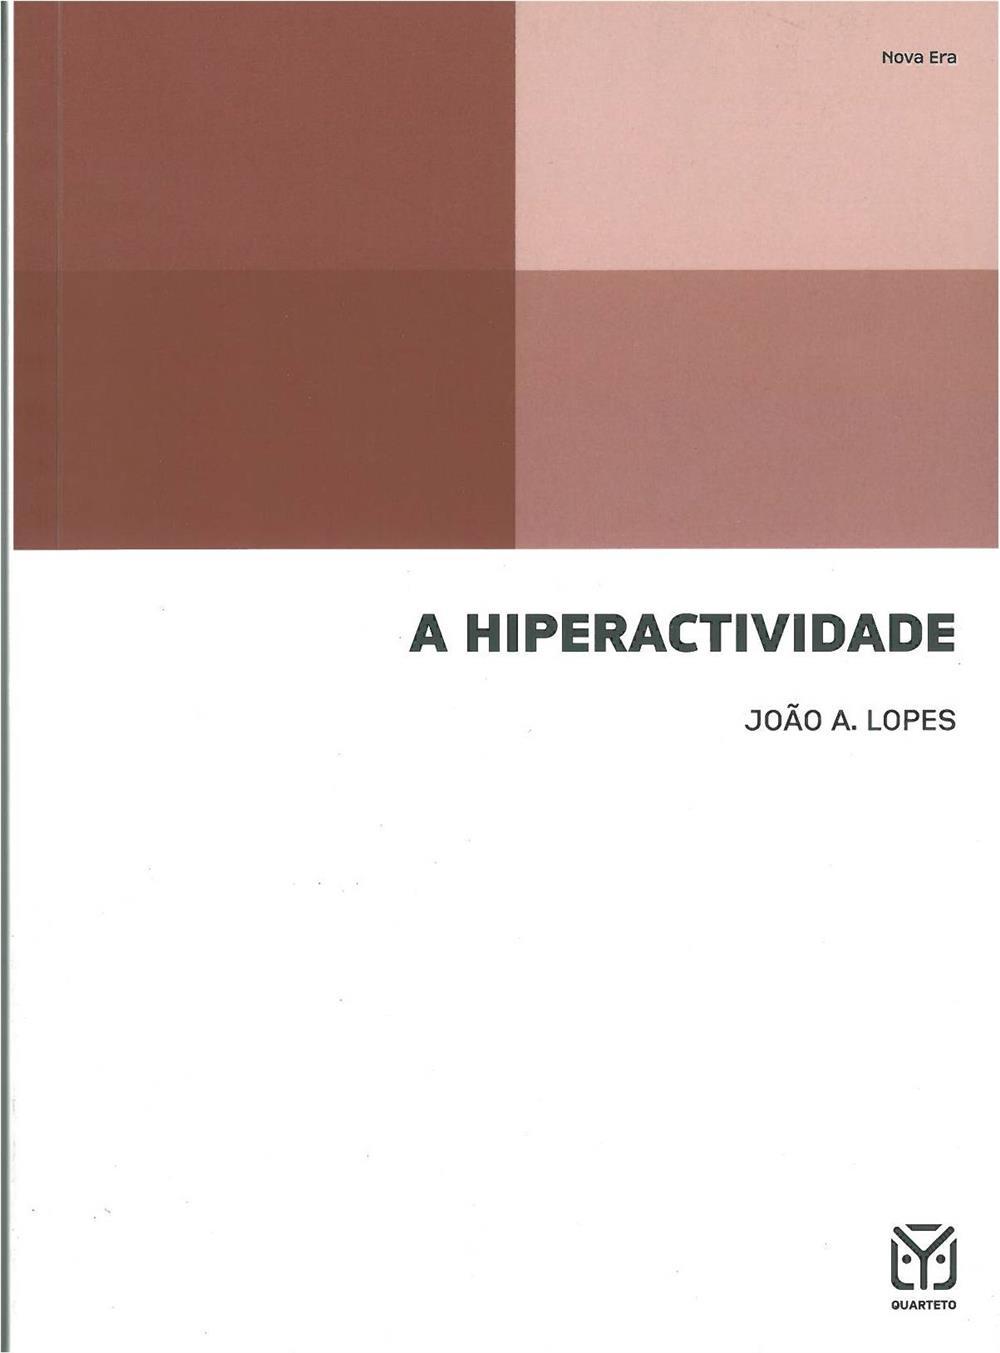 A hiperactividade_.jpg